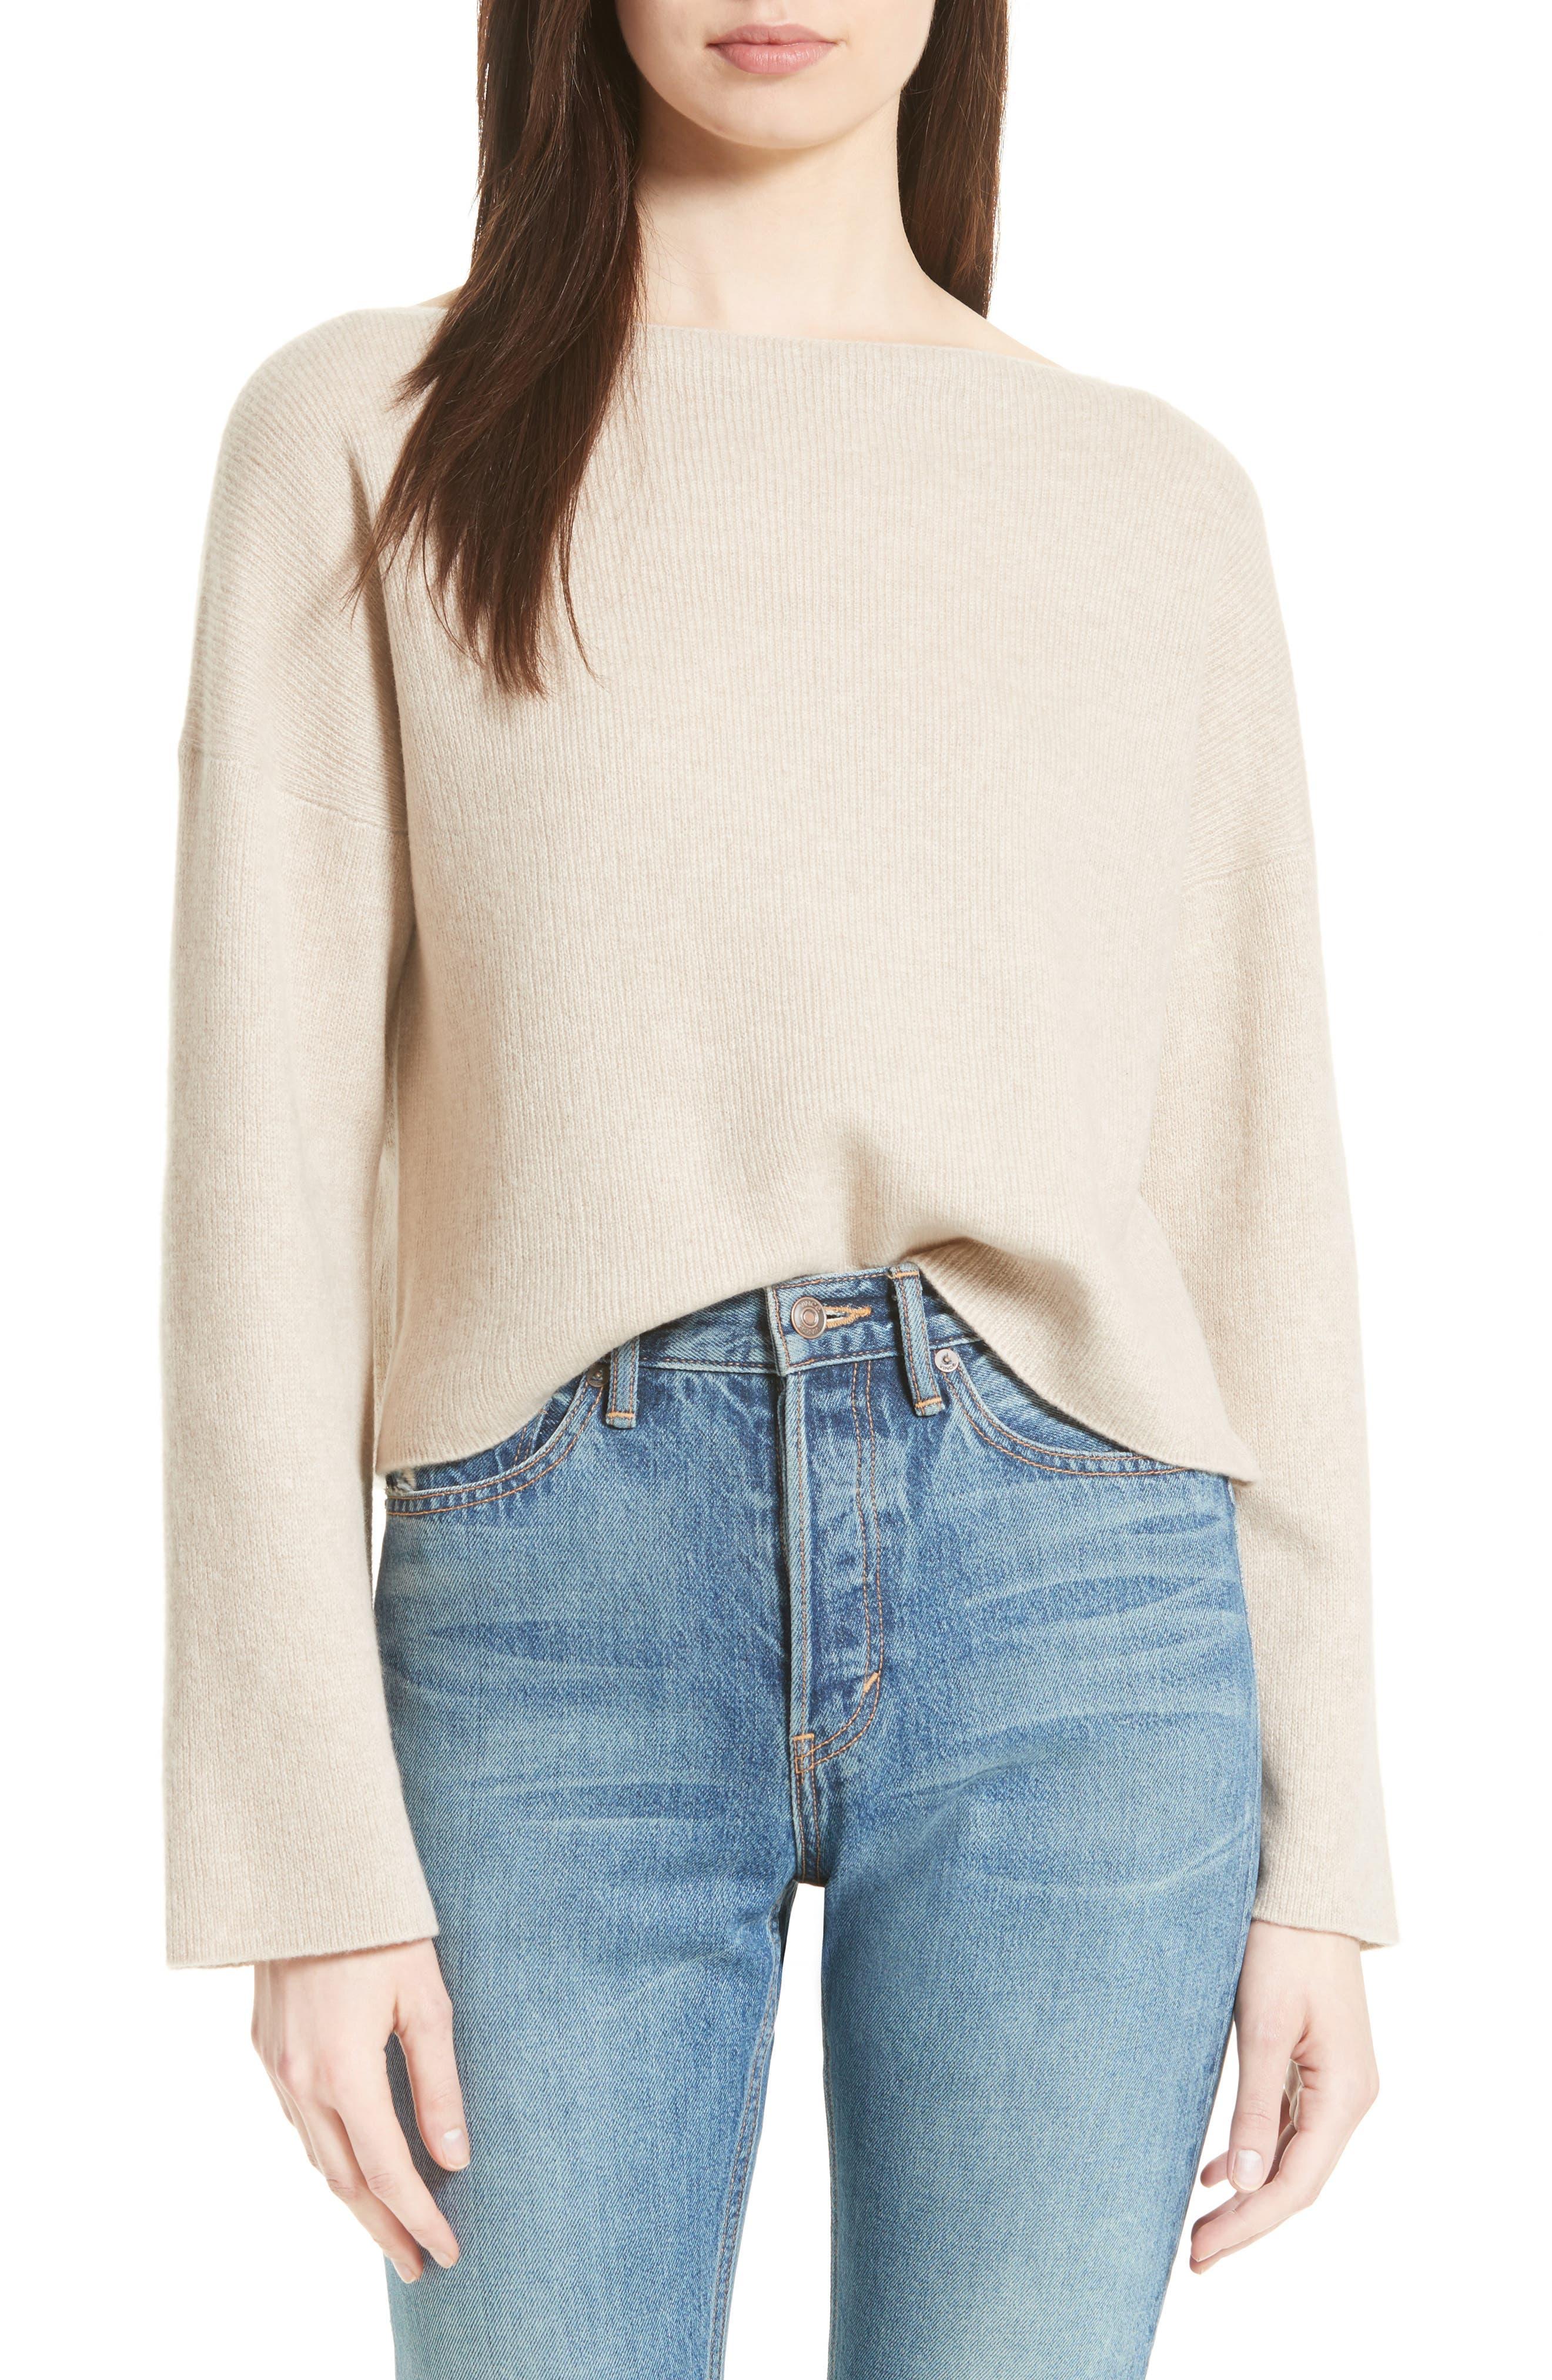 VINCE Boxy Cashmere Sweater, Main, color, 233